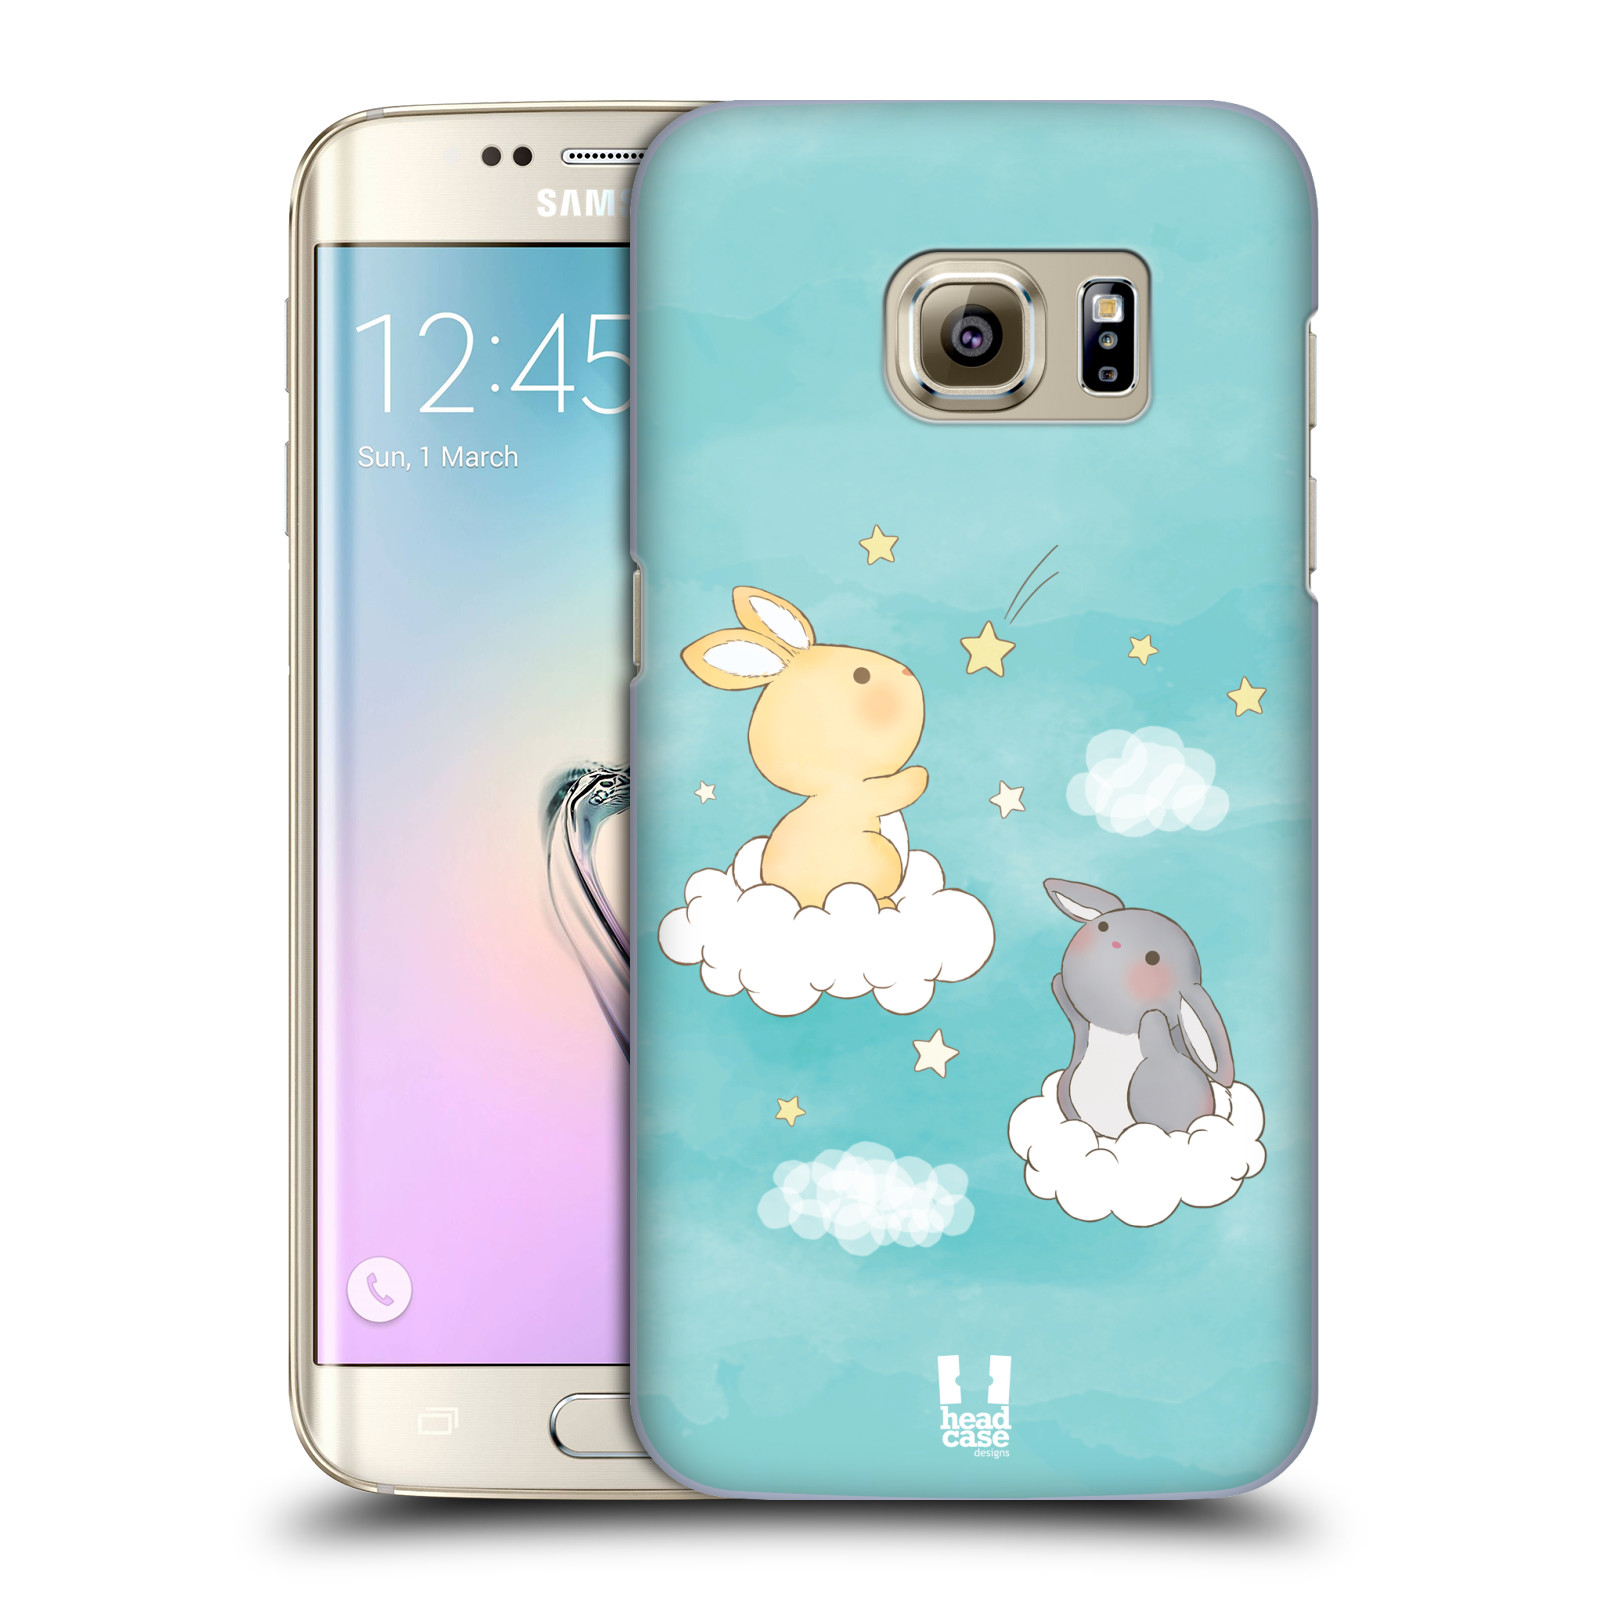 HEAD CASE plastový obal na mobil SAMSUNG GALAXY S7 EDGE vzor králíček a hvězdy modrá